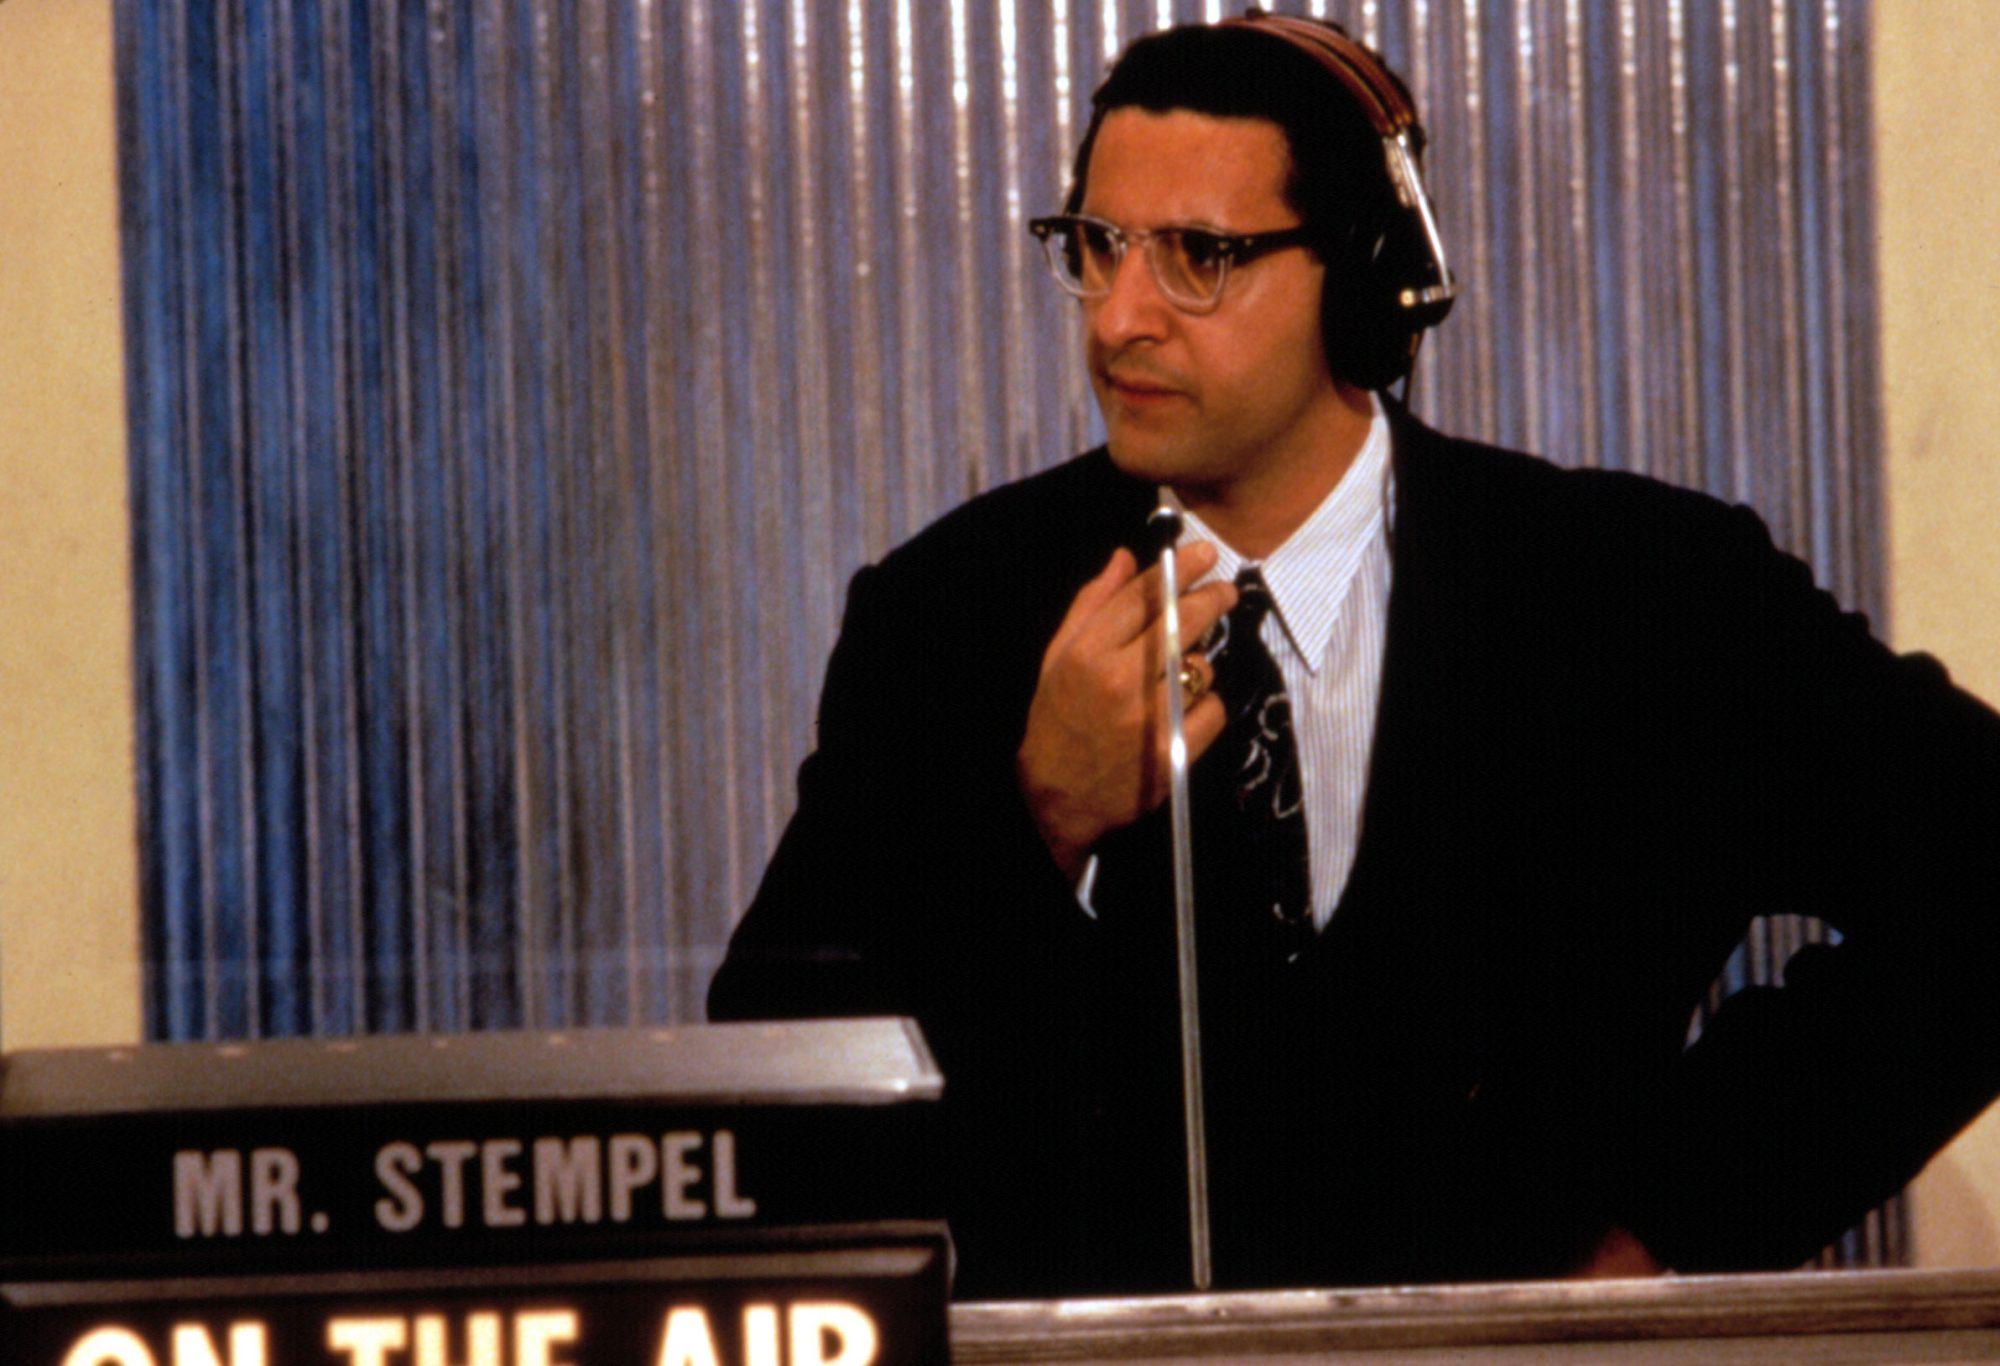 Herb Stempel